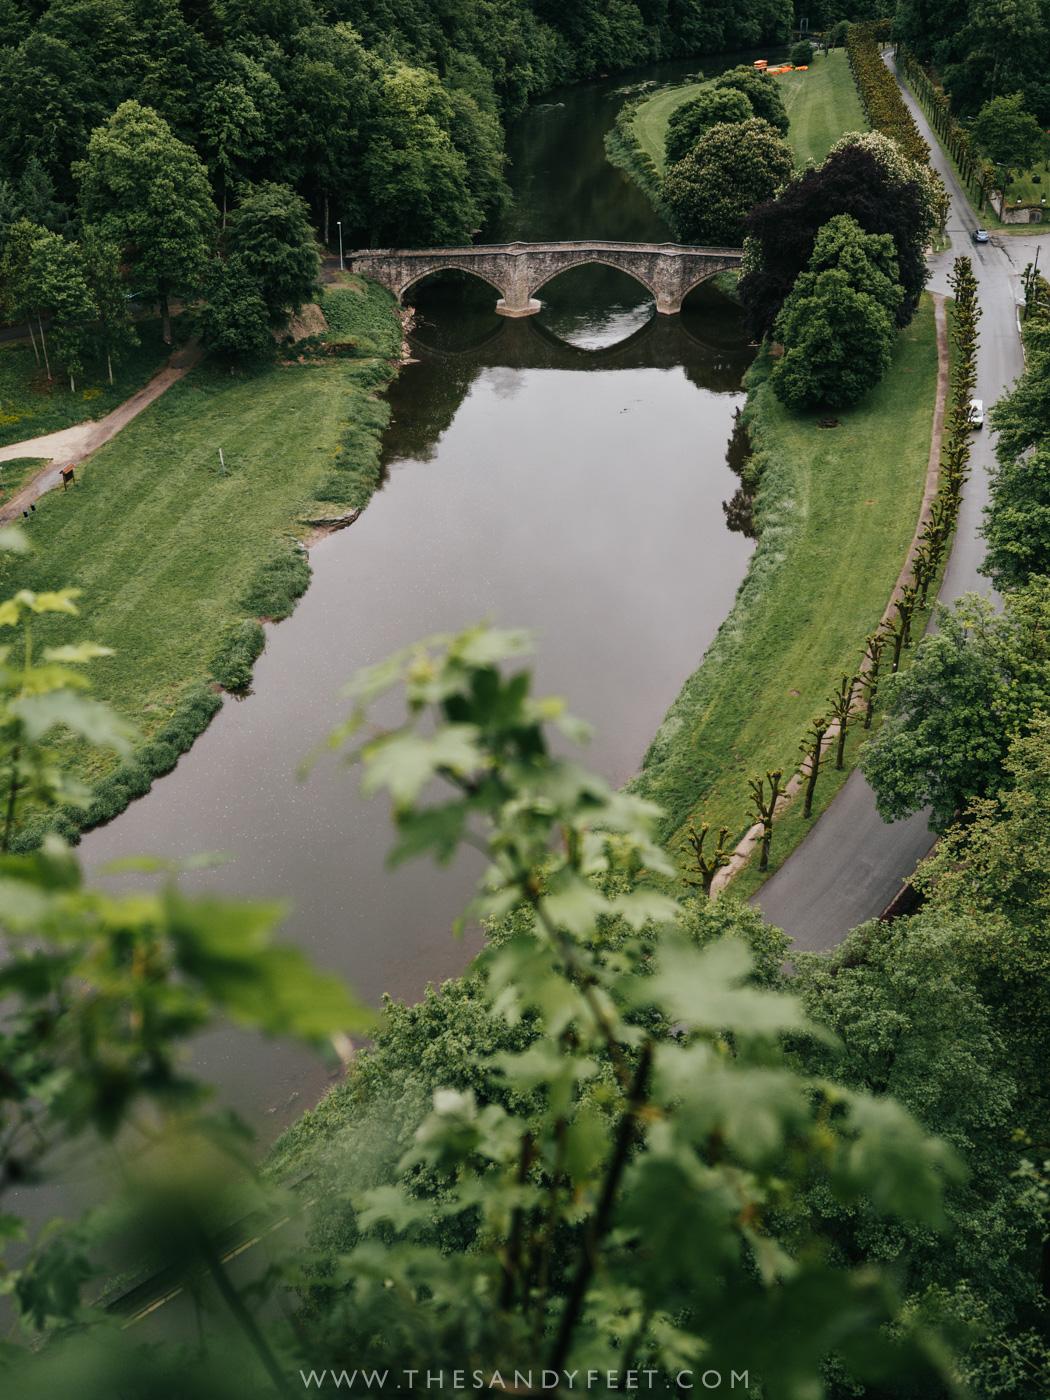 Hiking around Bouillon | Top Things To Do In Belgium's Wallonia Region